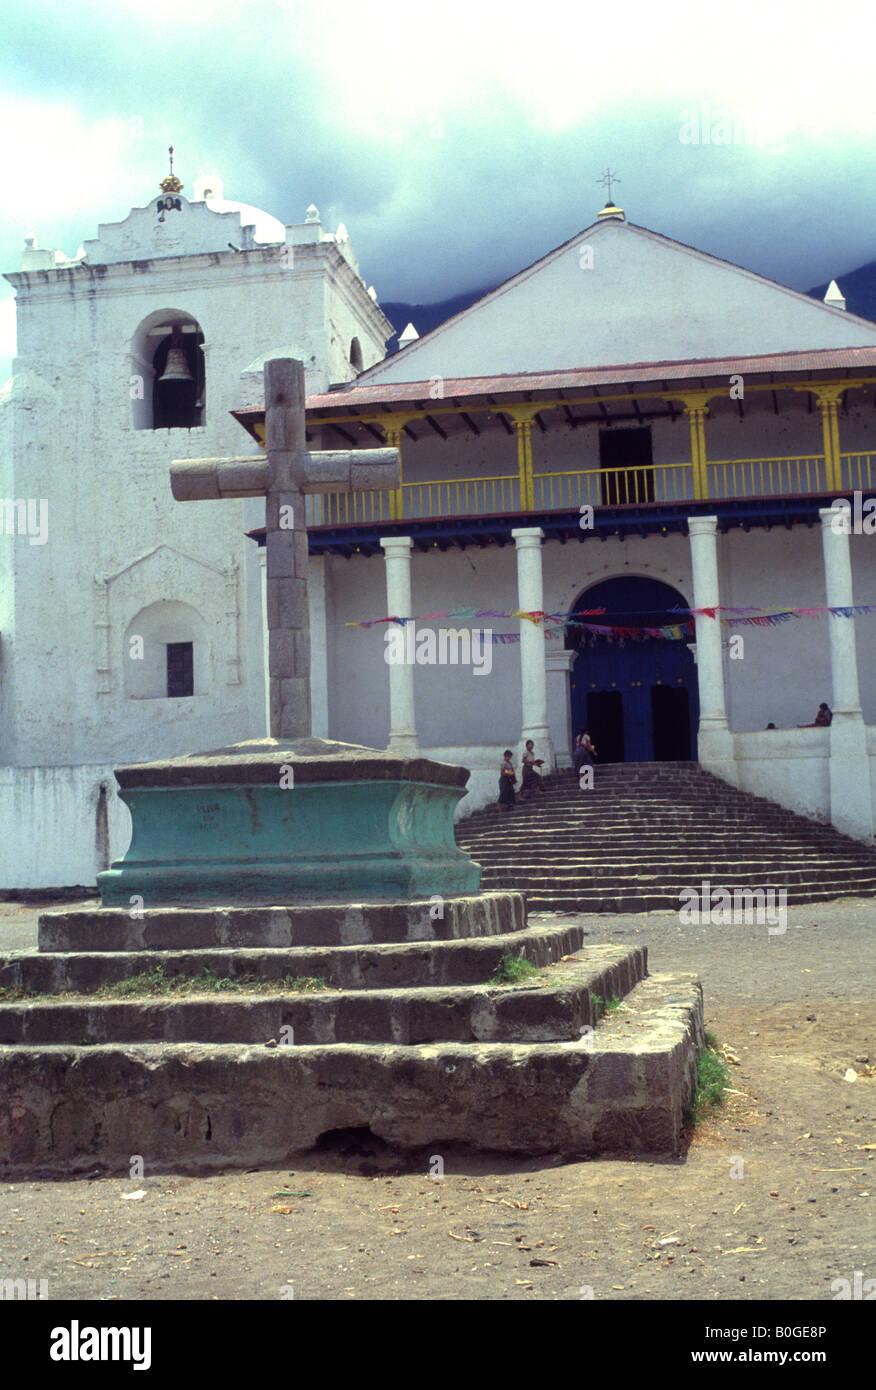 Village square and church, Santiago Atitlan village, Guatemala - Stock Image